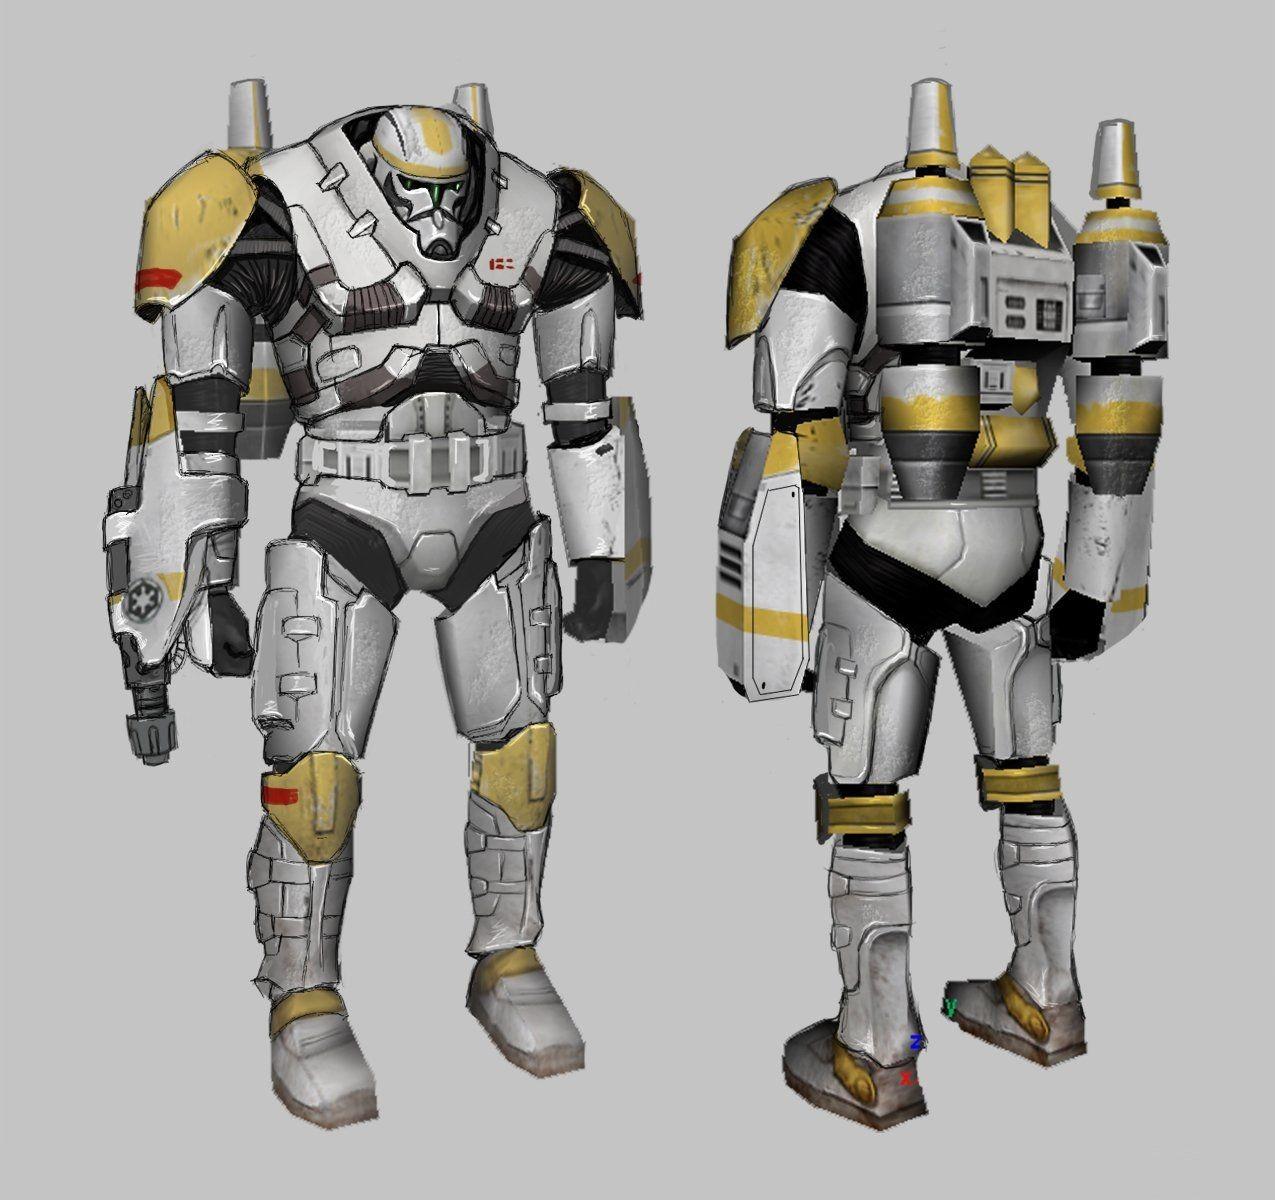 CloneBlazeTrooper.JPG